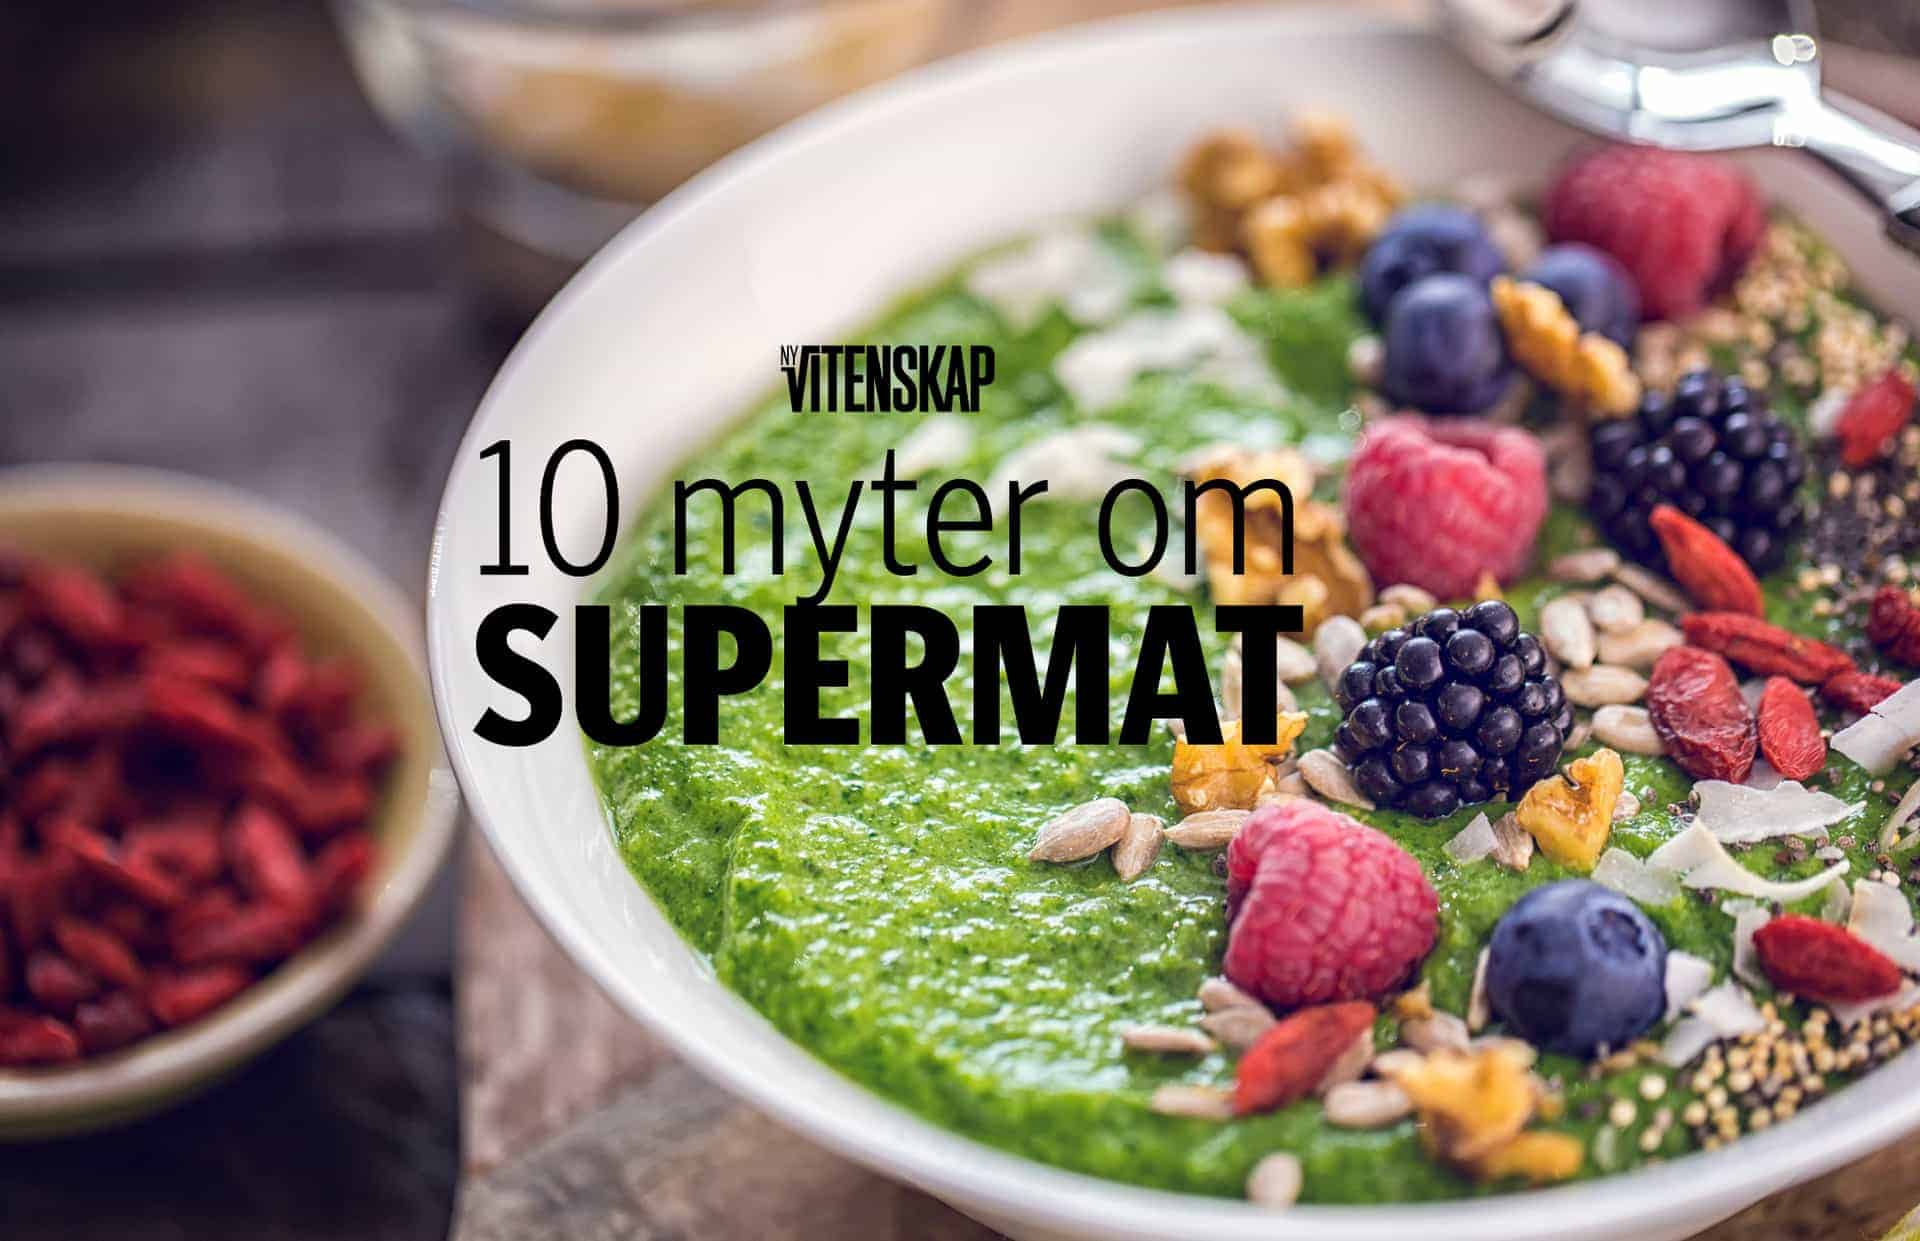 10 myter om supermat